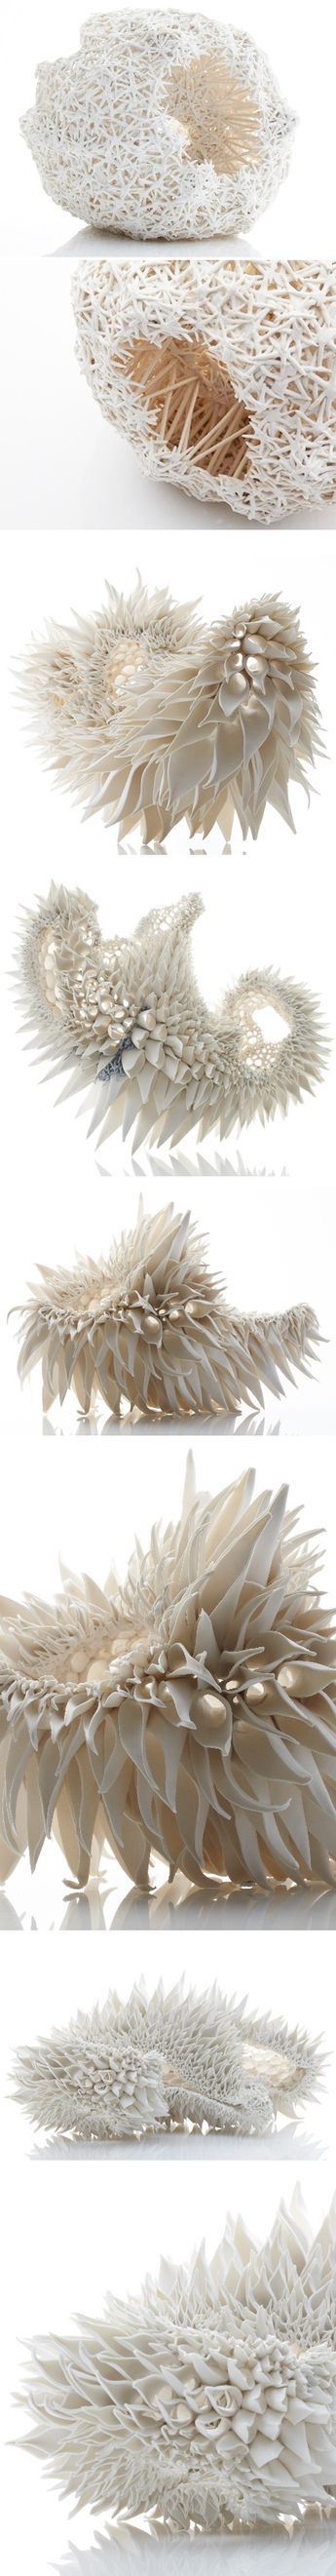 Ceramica organica de Nuala o'donovan